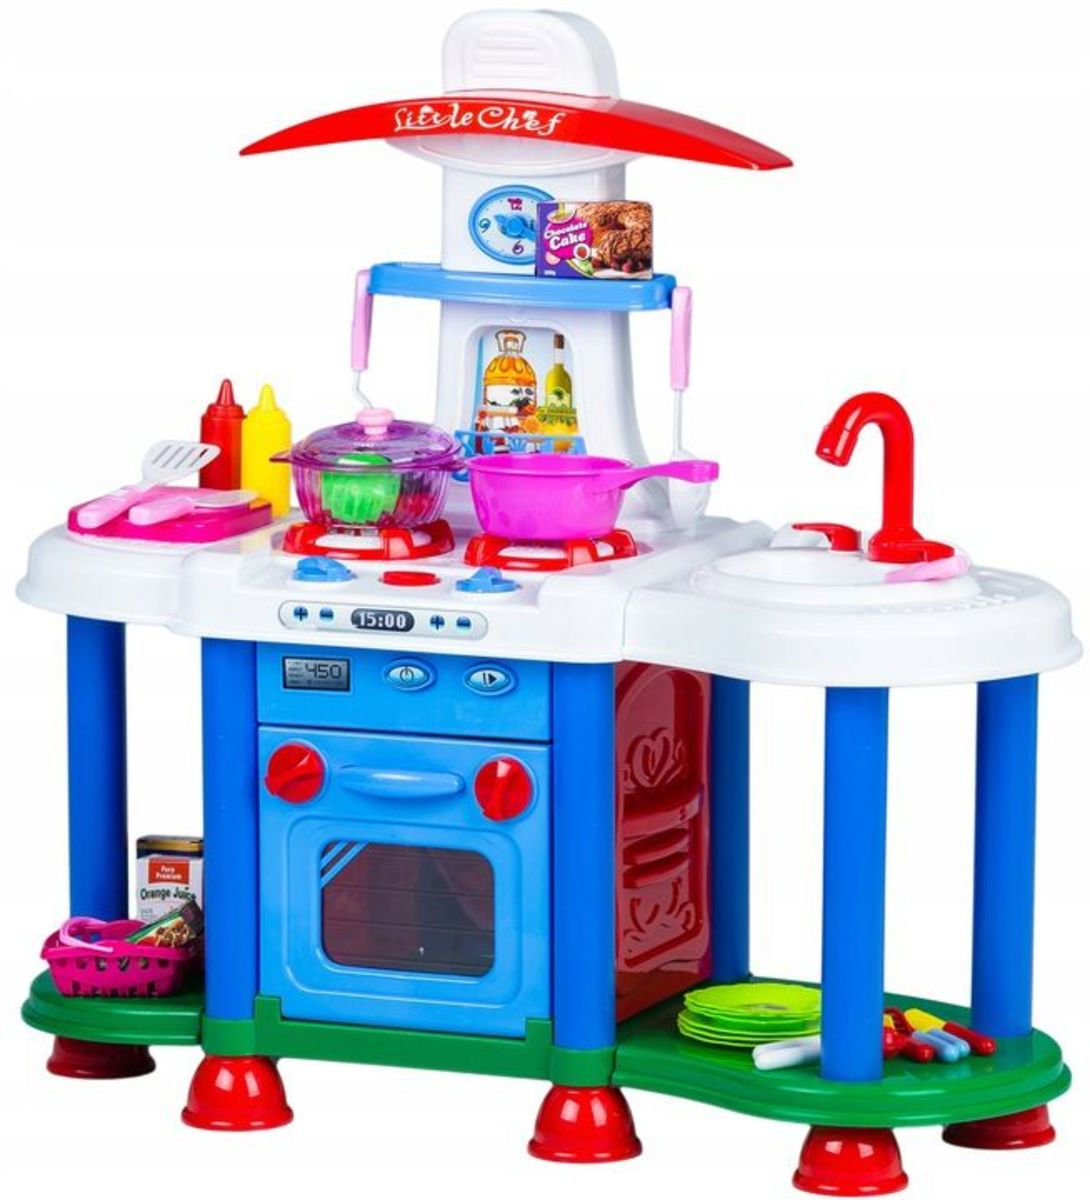 Detská kuchynka Little Chef